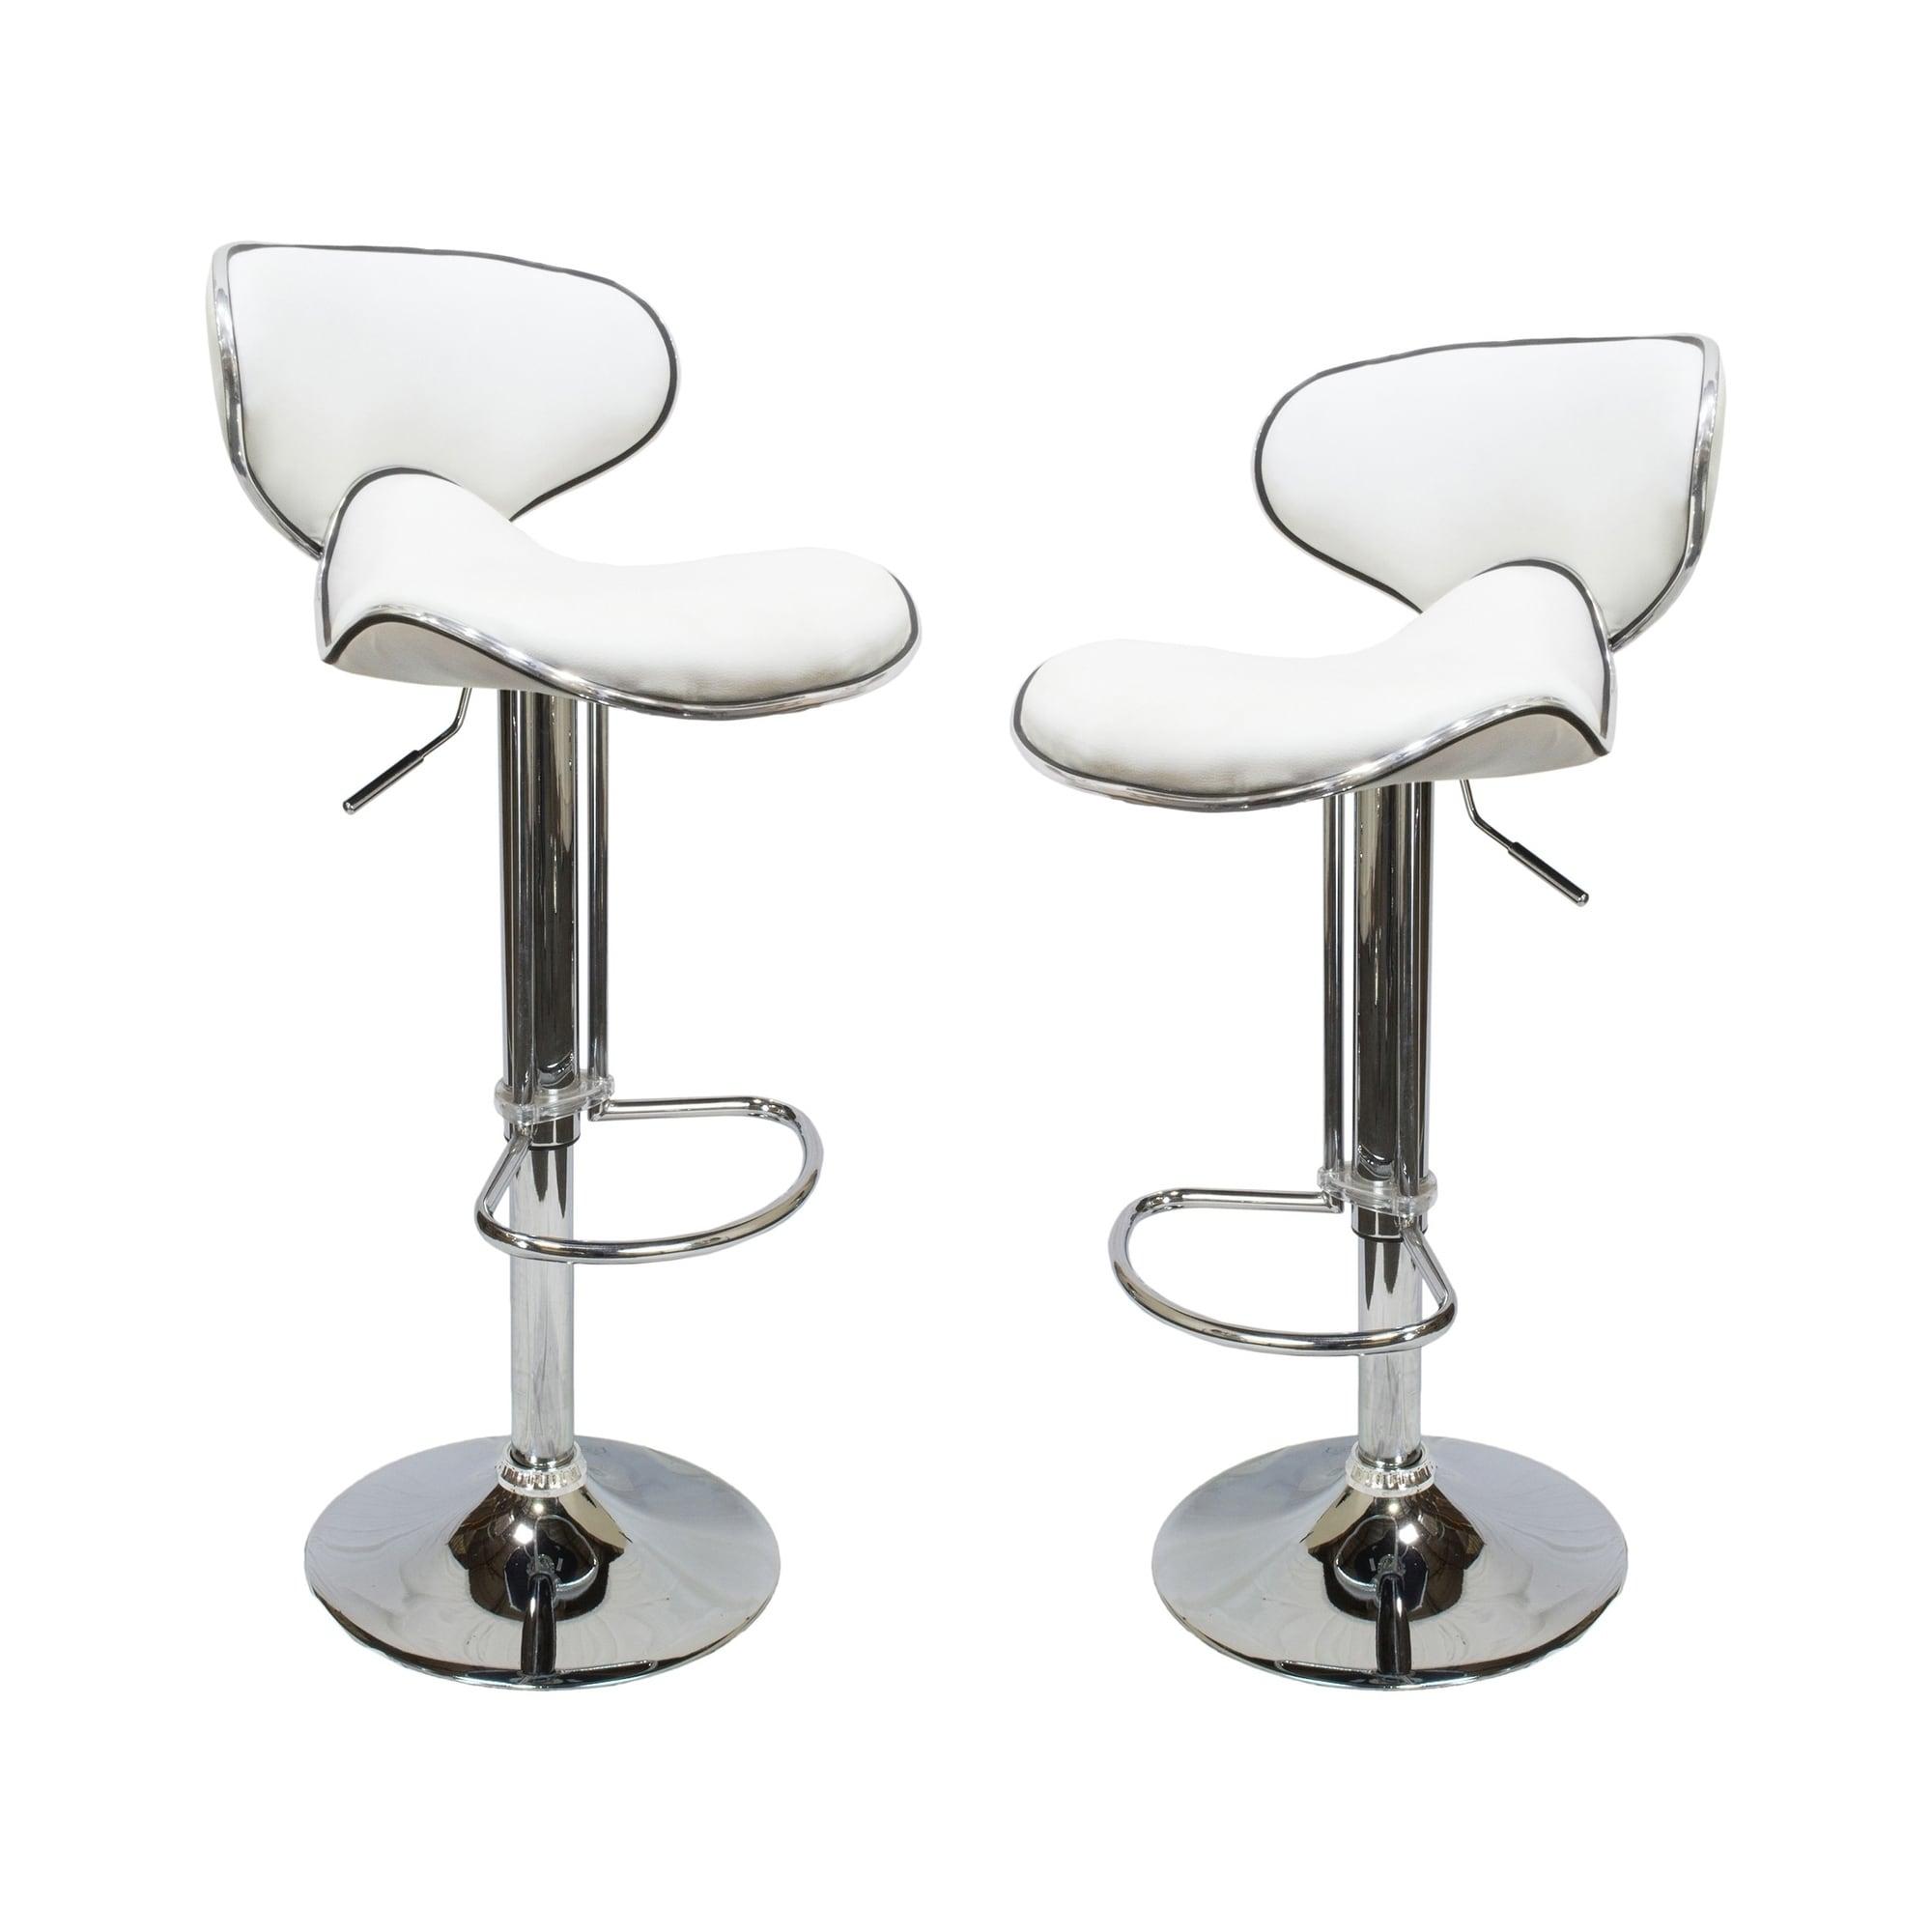 Strange Best Master Furniture Modern Adjustable Swivel Bar Stool Set Of 2 Bralicious Painted Fabric Chair Ideas Braliciousco